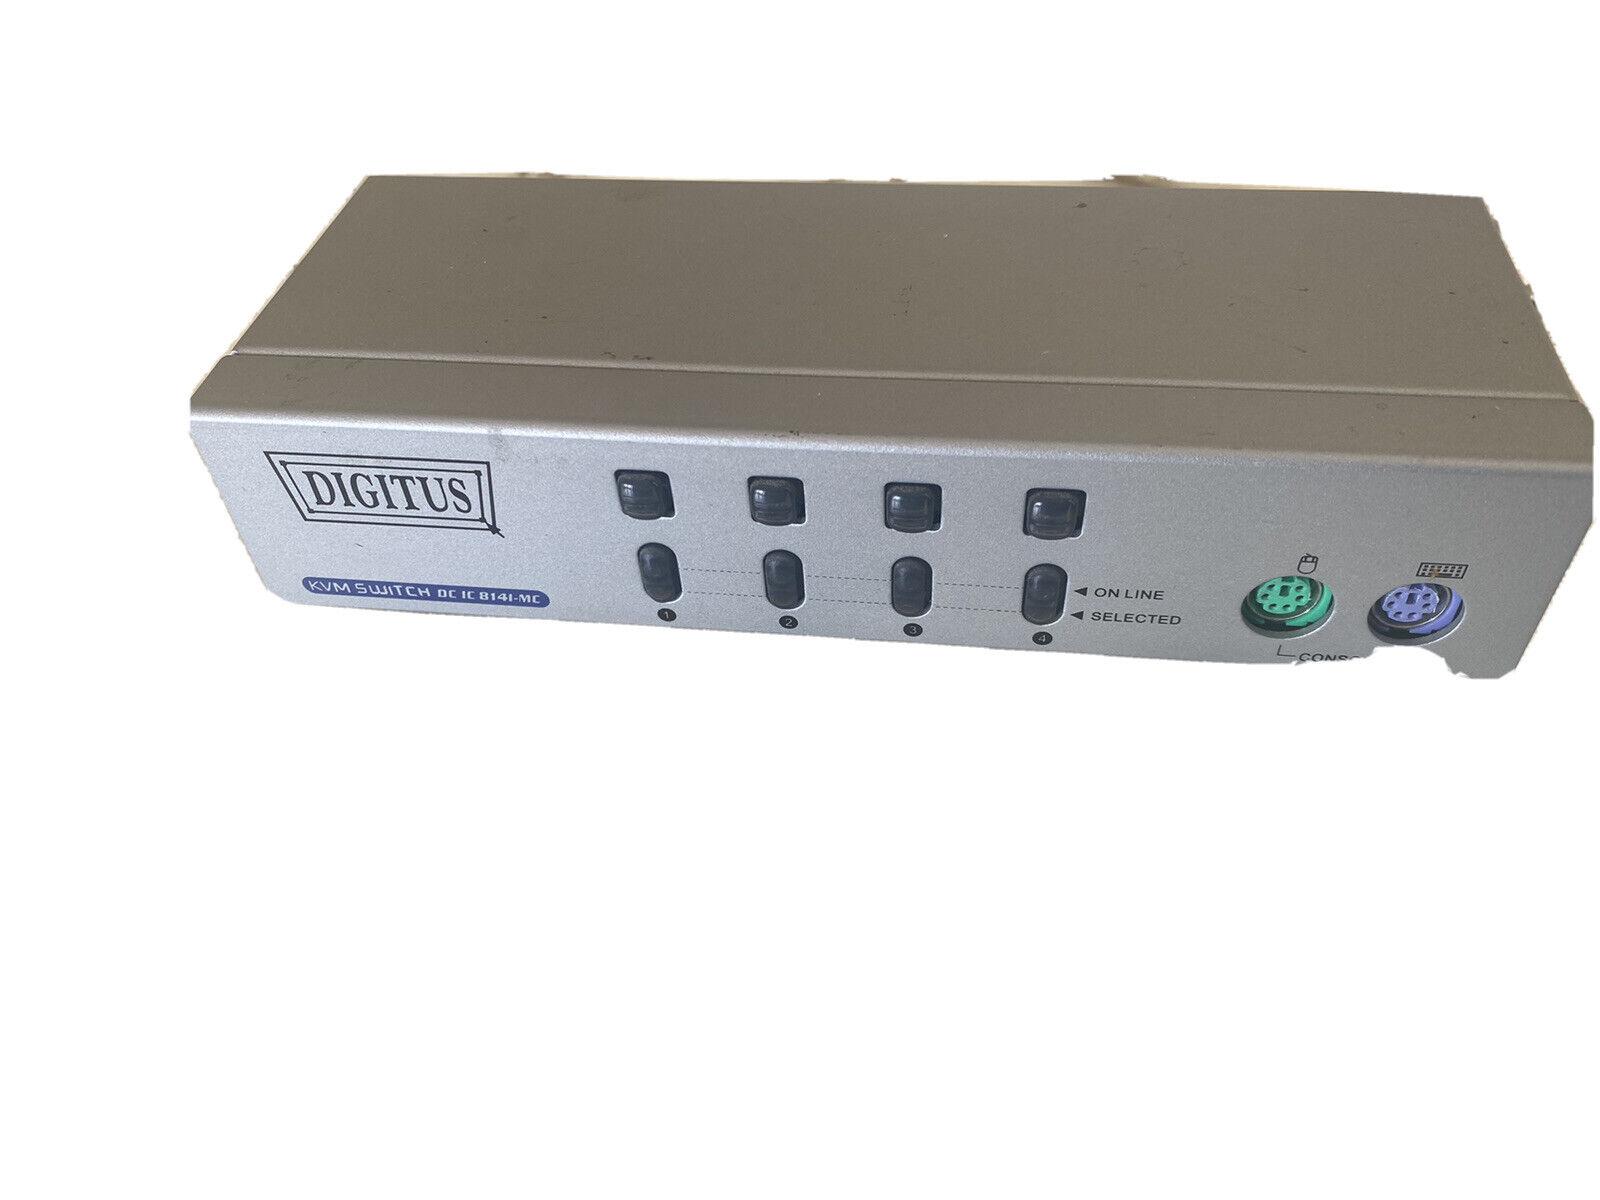 KVM Switch Model DC 8141